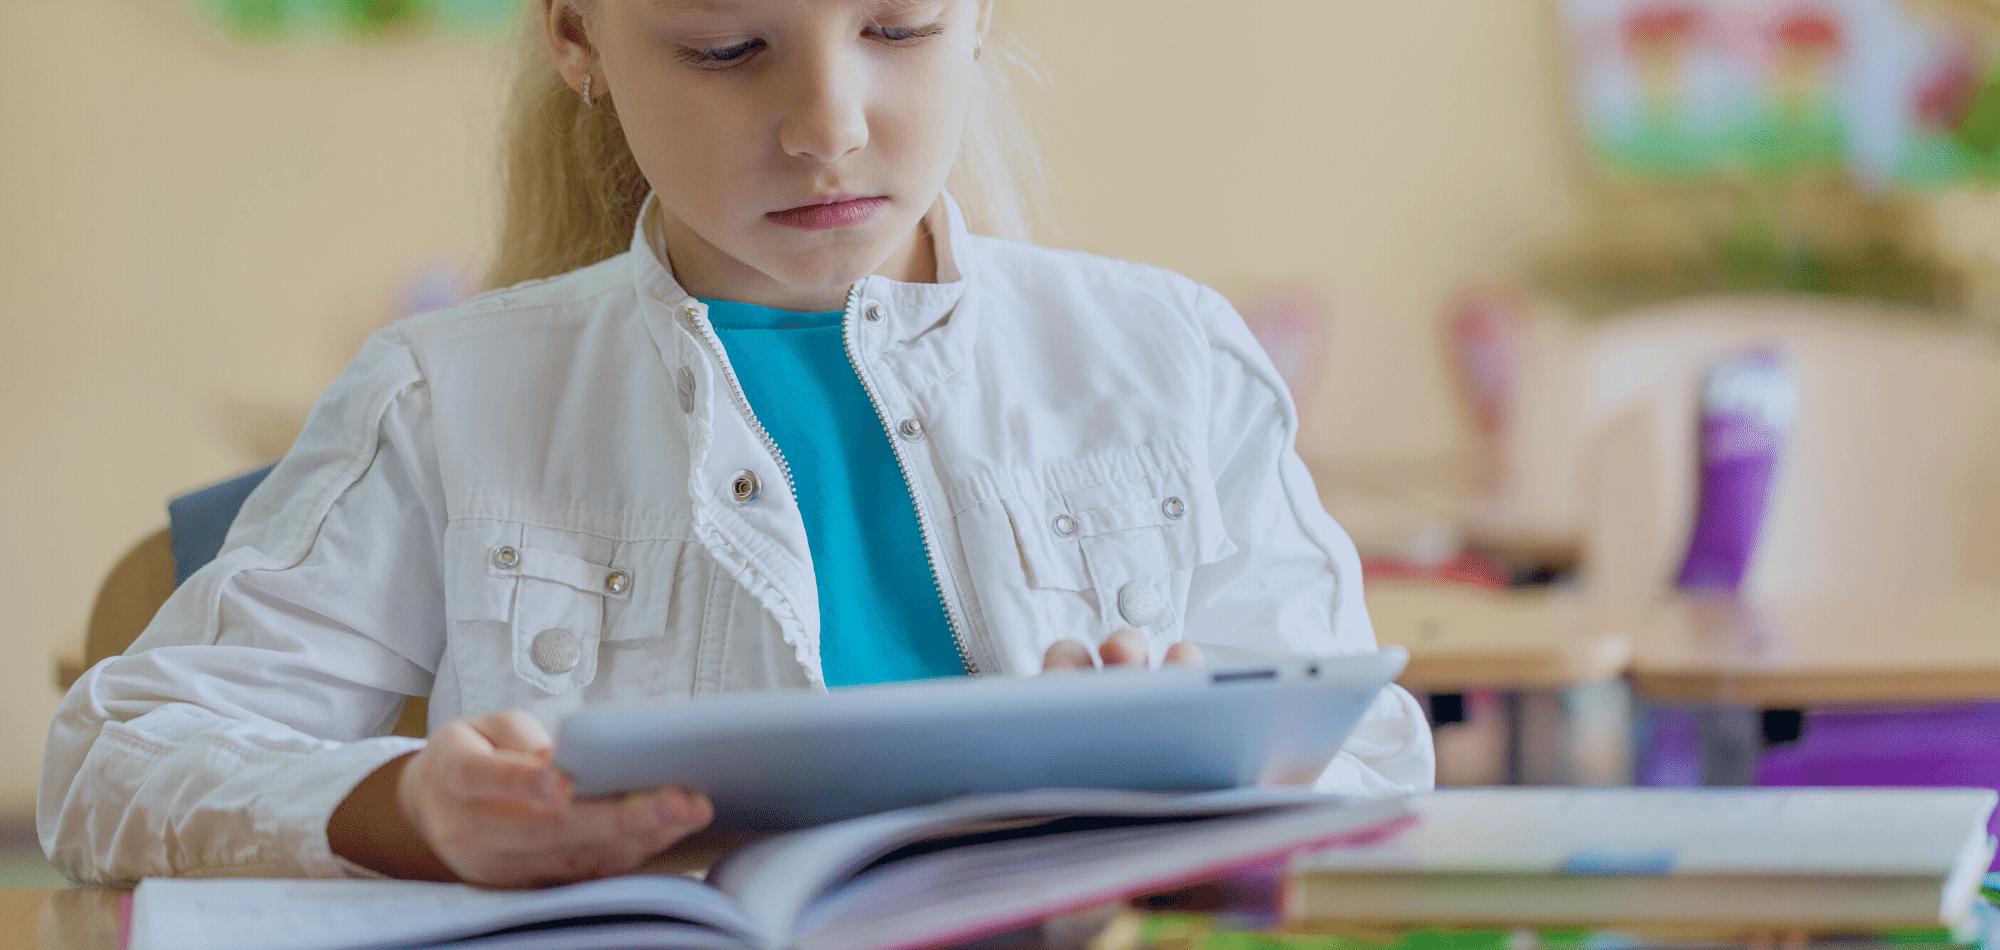 student in k12 using an iPad in school-2